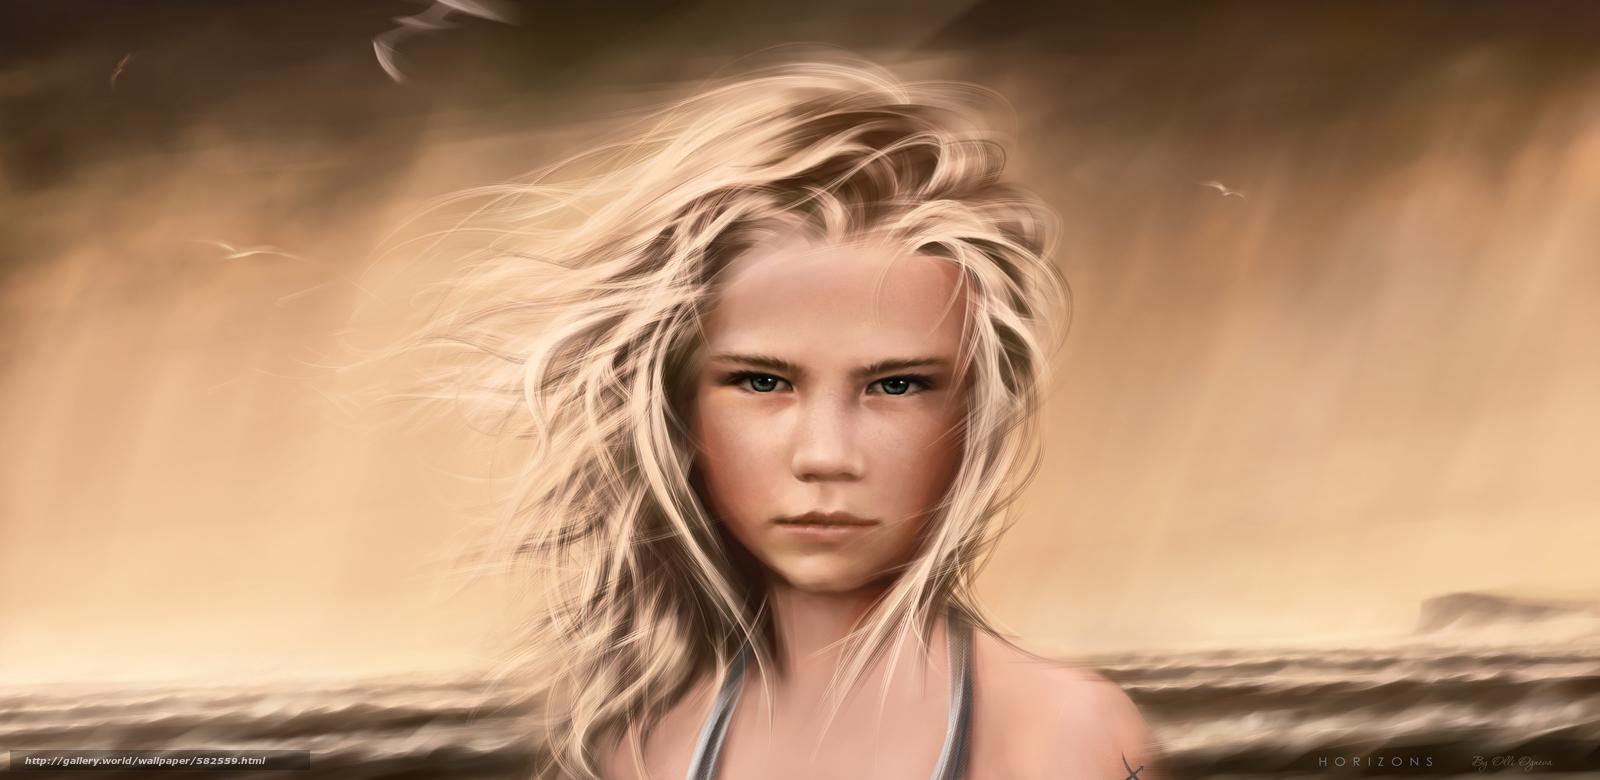 Baixar Wallpaper SEAGULLS,  cabelo,  menina,  tempestade Papis de parede grtis na resoluo 4450x2170 — quadro №582559